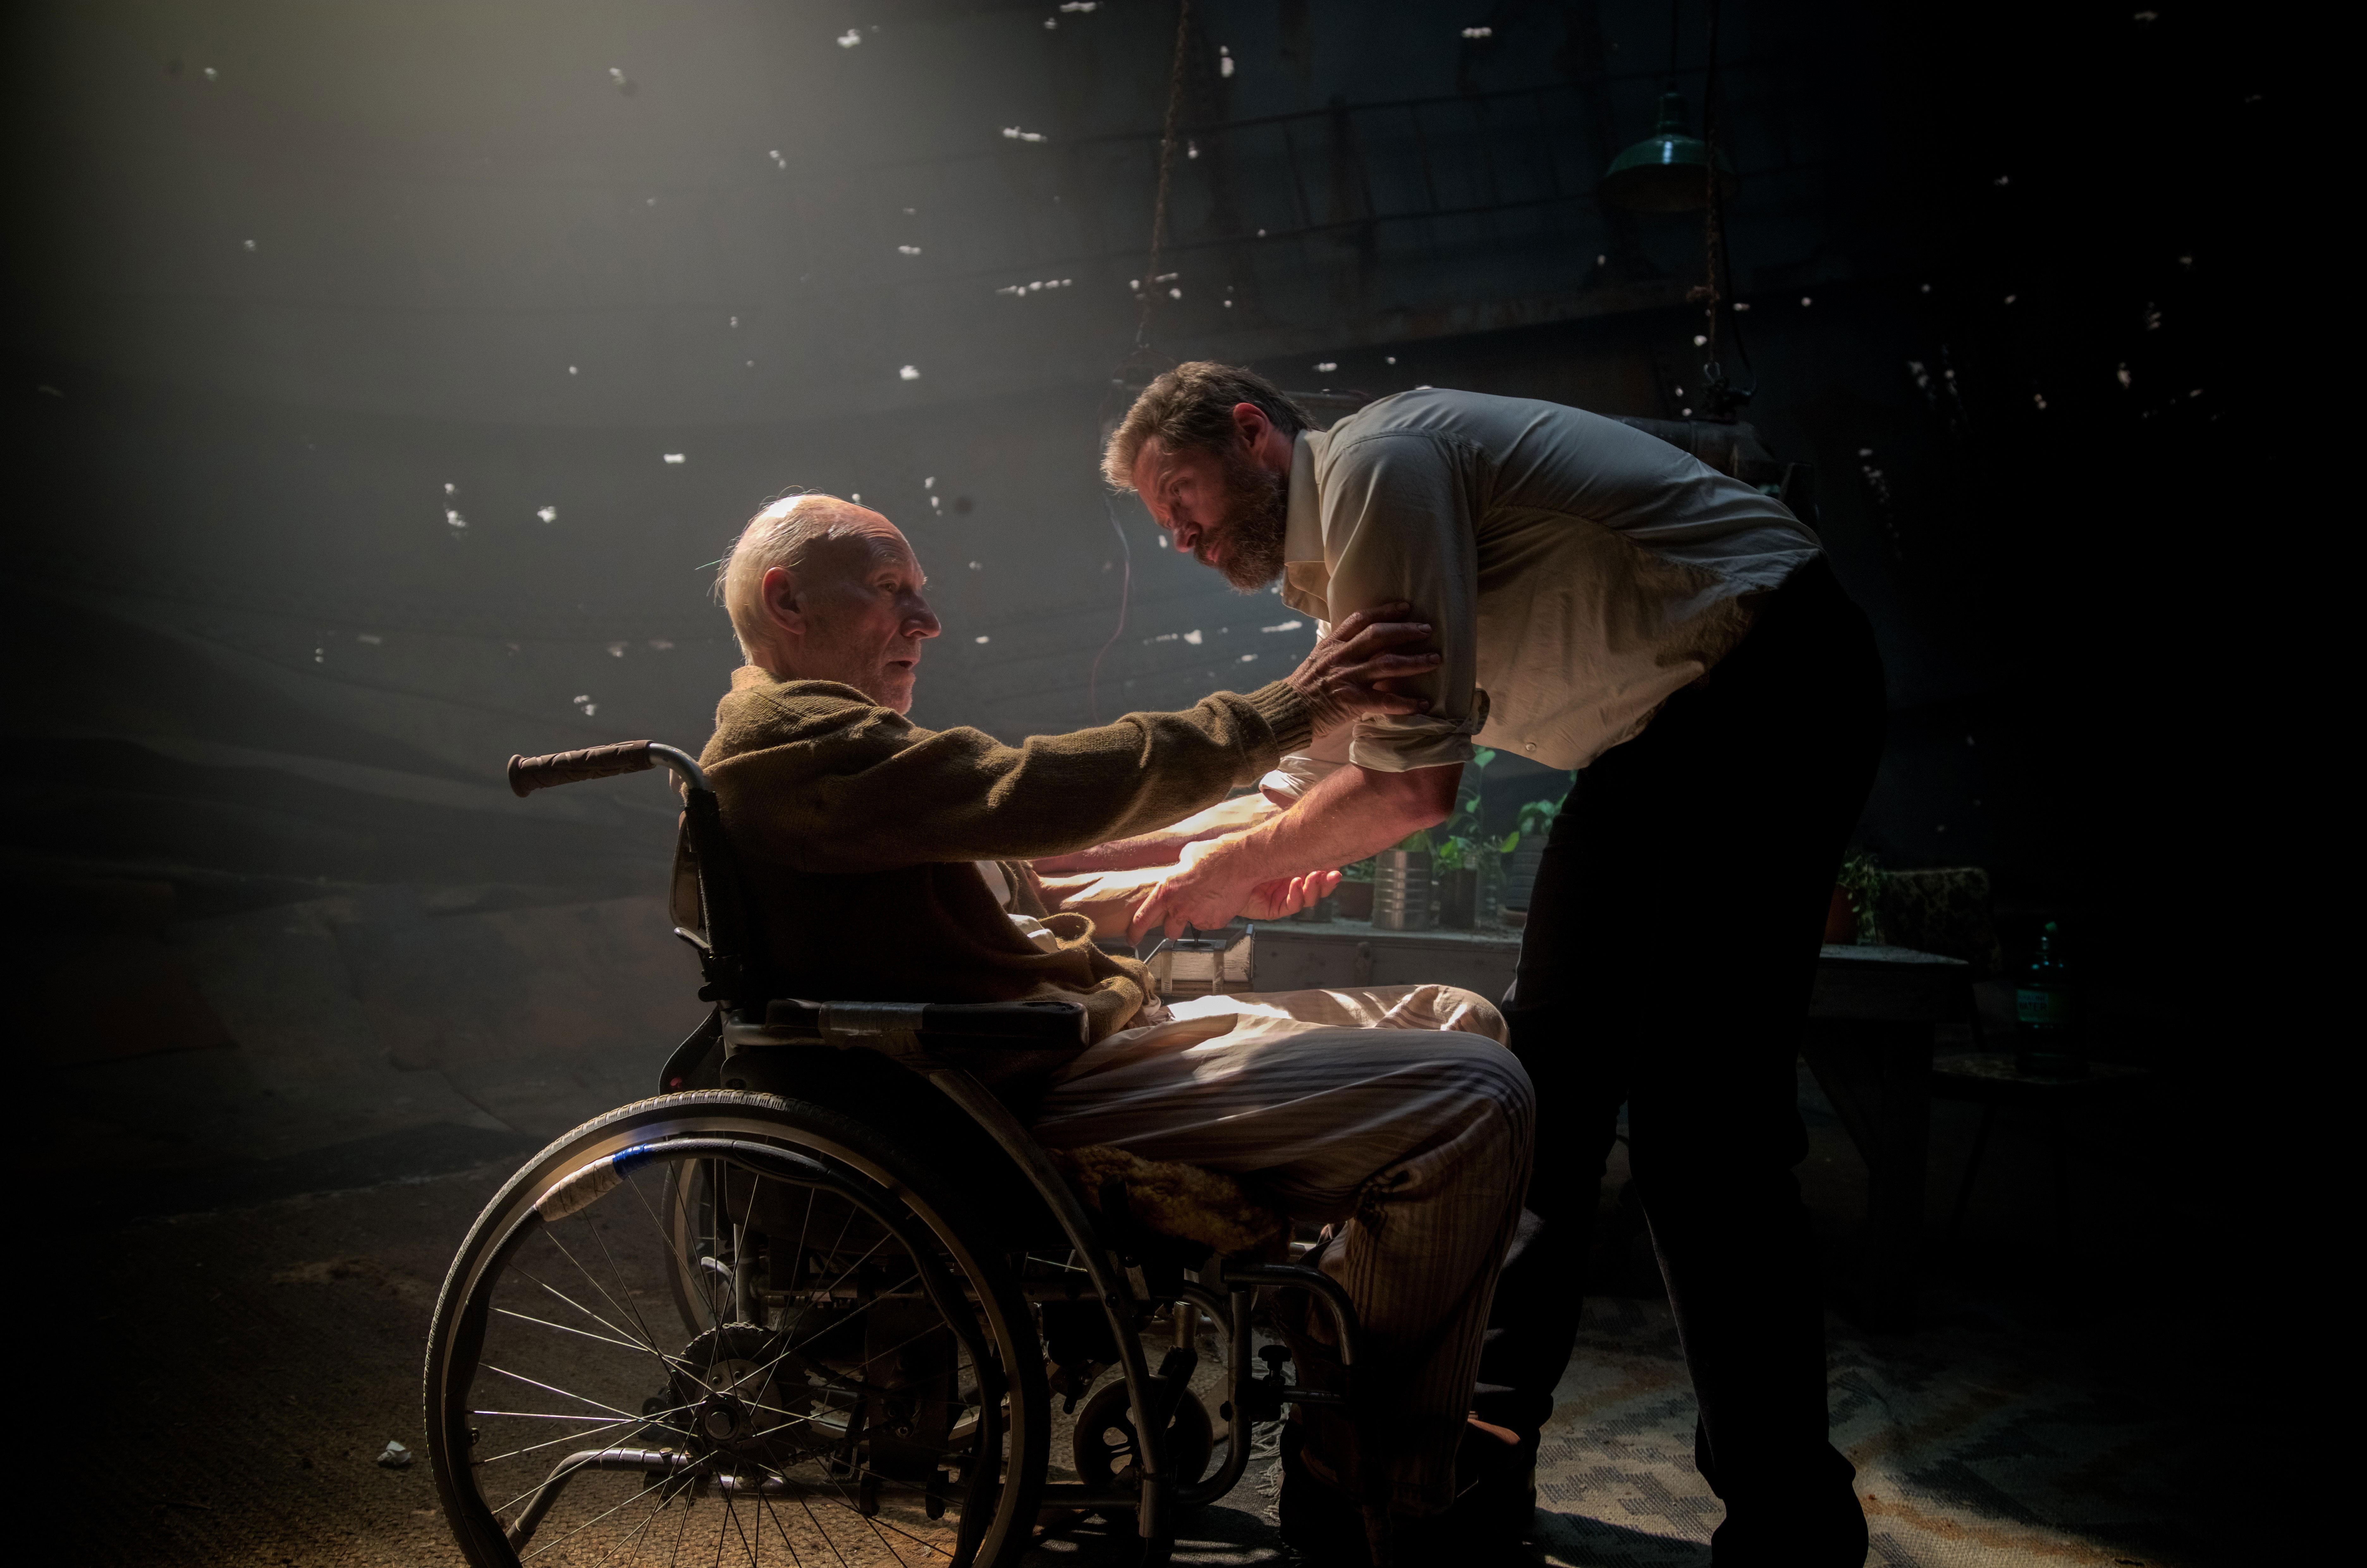 Hugh Jackman Wallpapers Hd: Hugh Jackman And Professor X, HD Movies, 4k Wallpapers